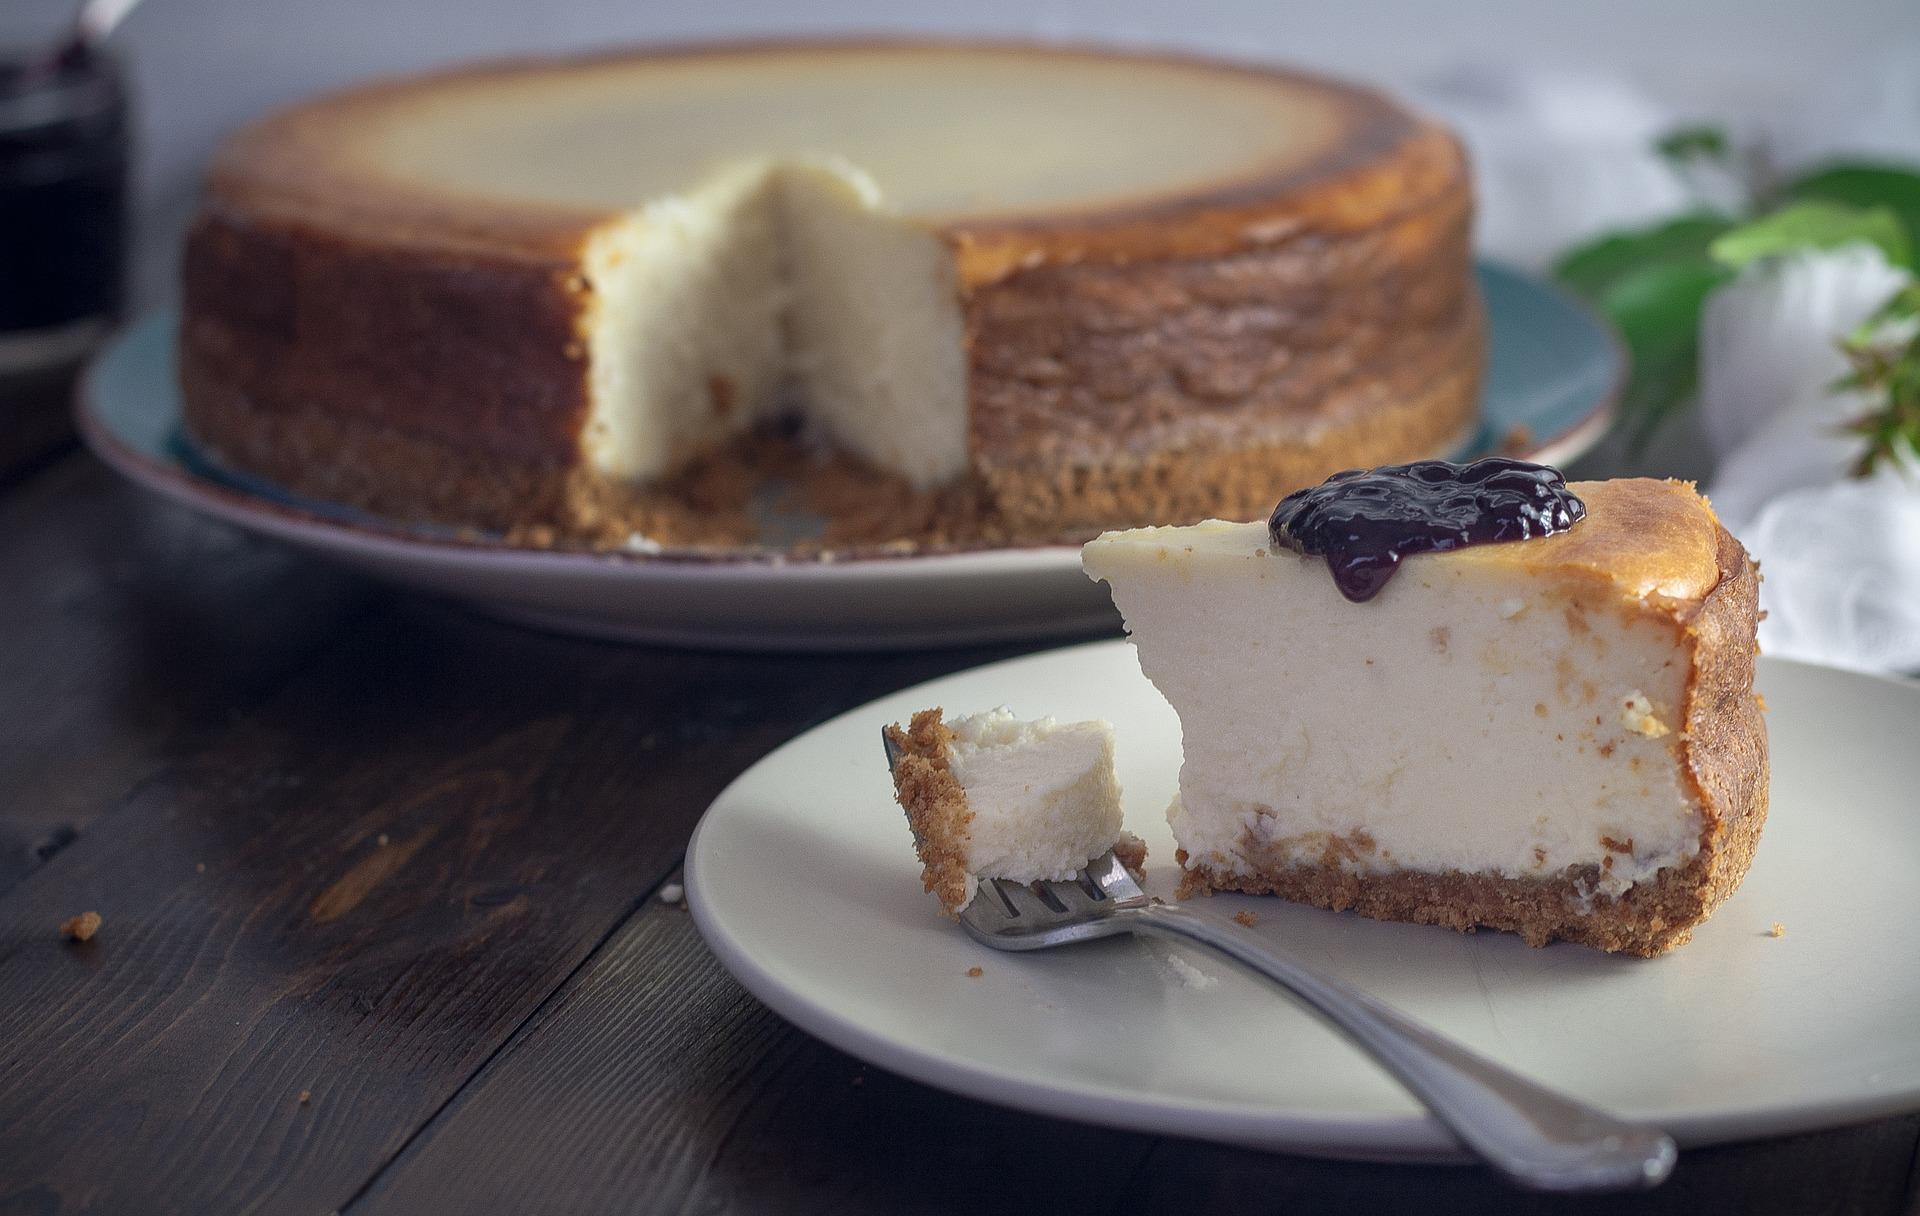 cheesecake-1578694_1920.jpg